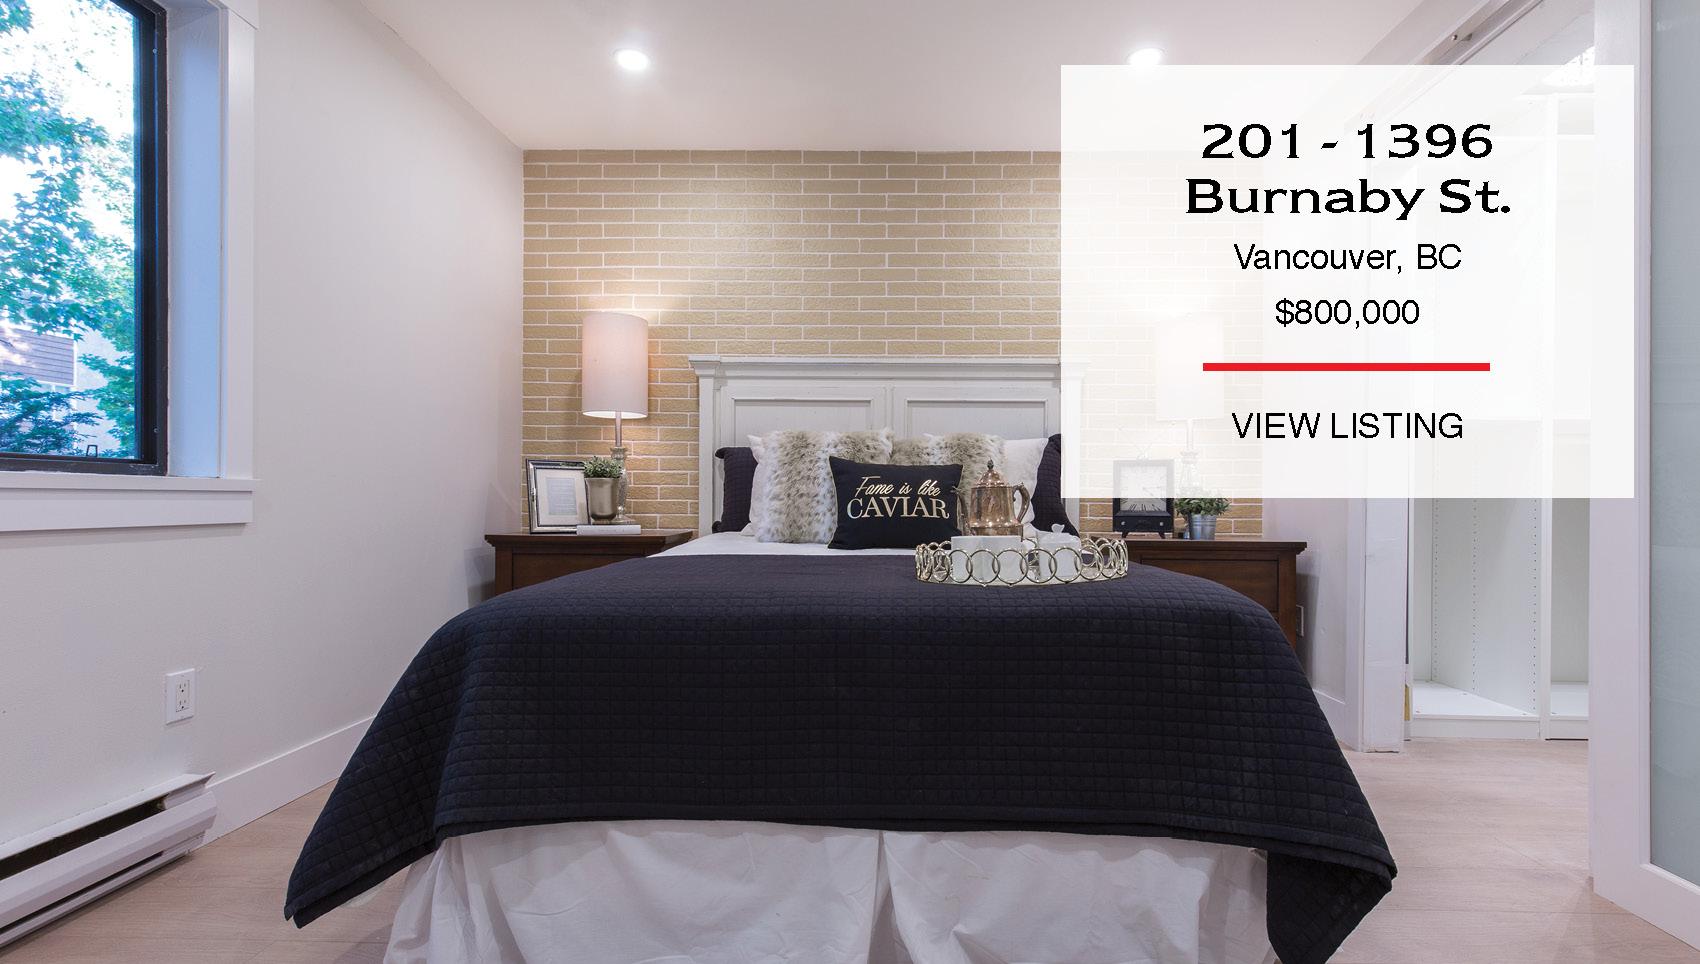 201-1396 Burnaby St.